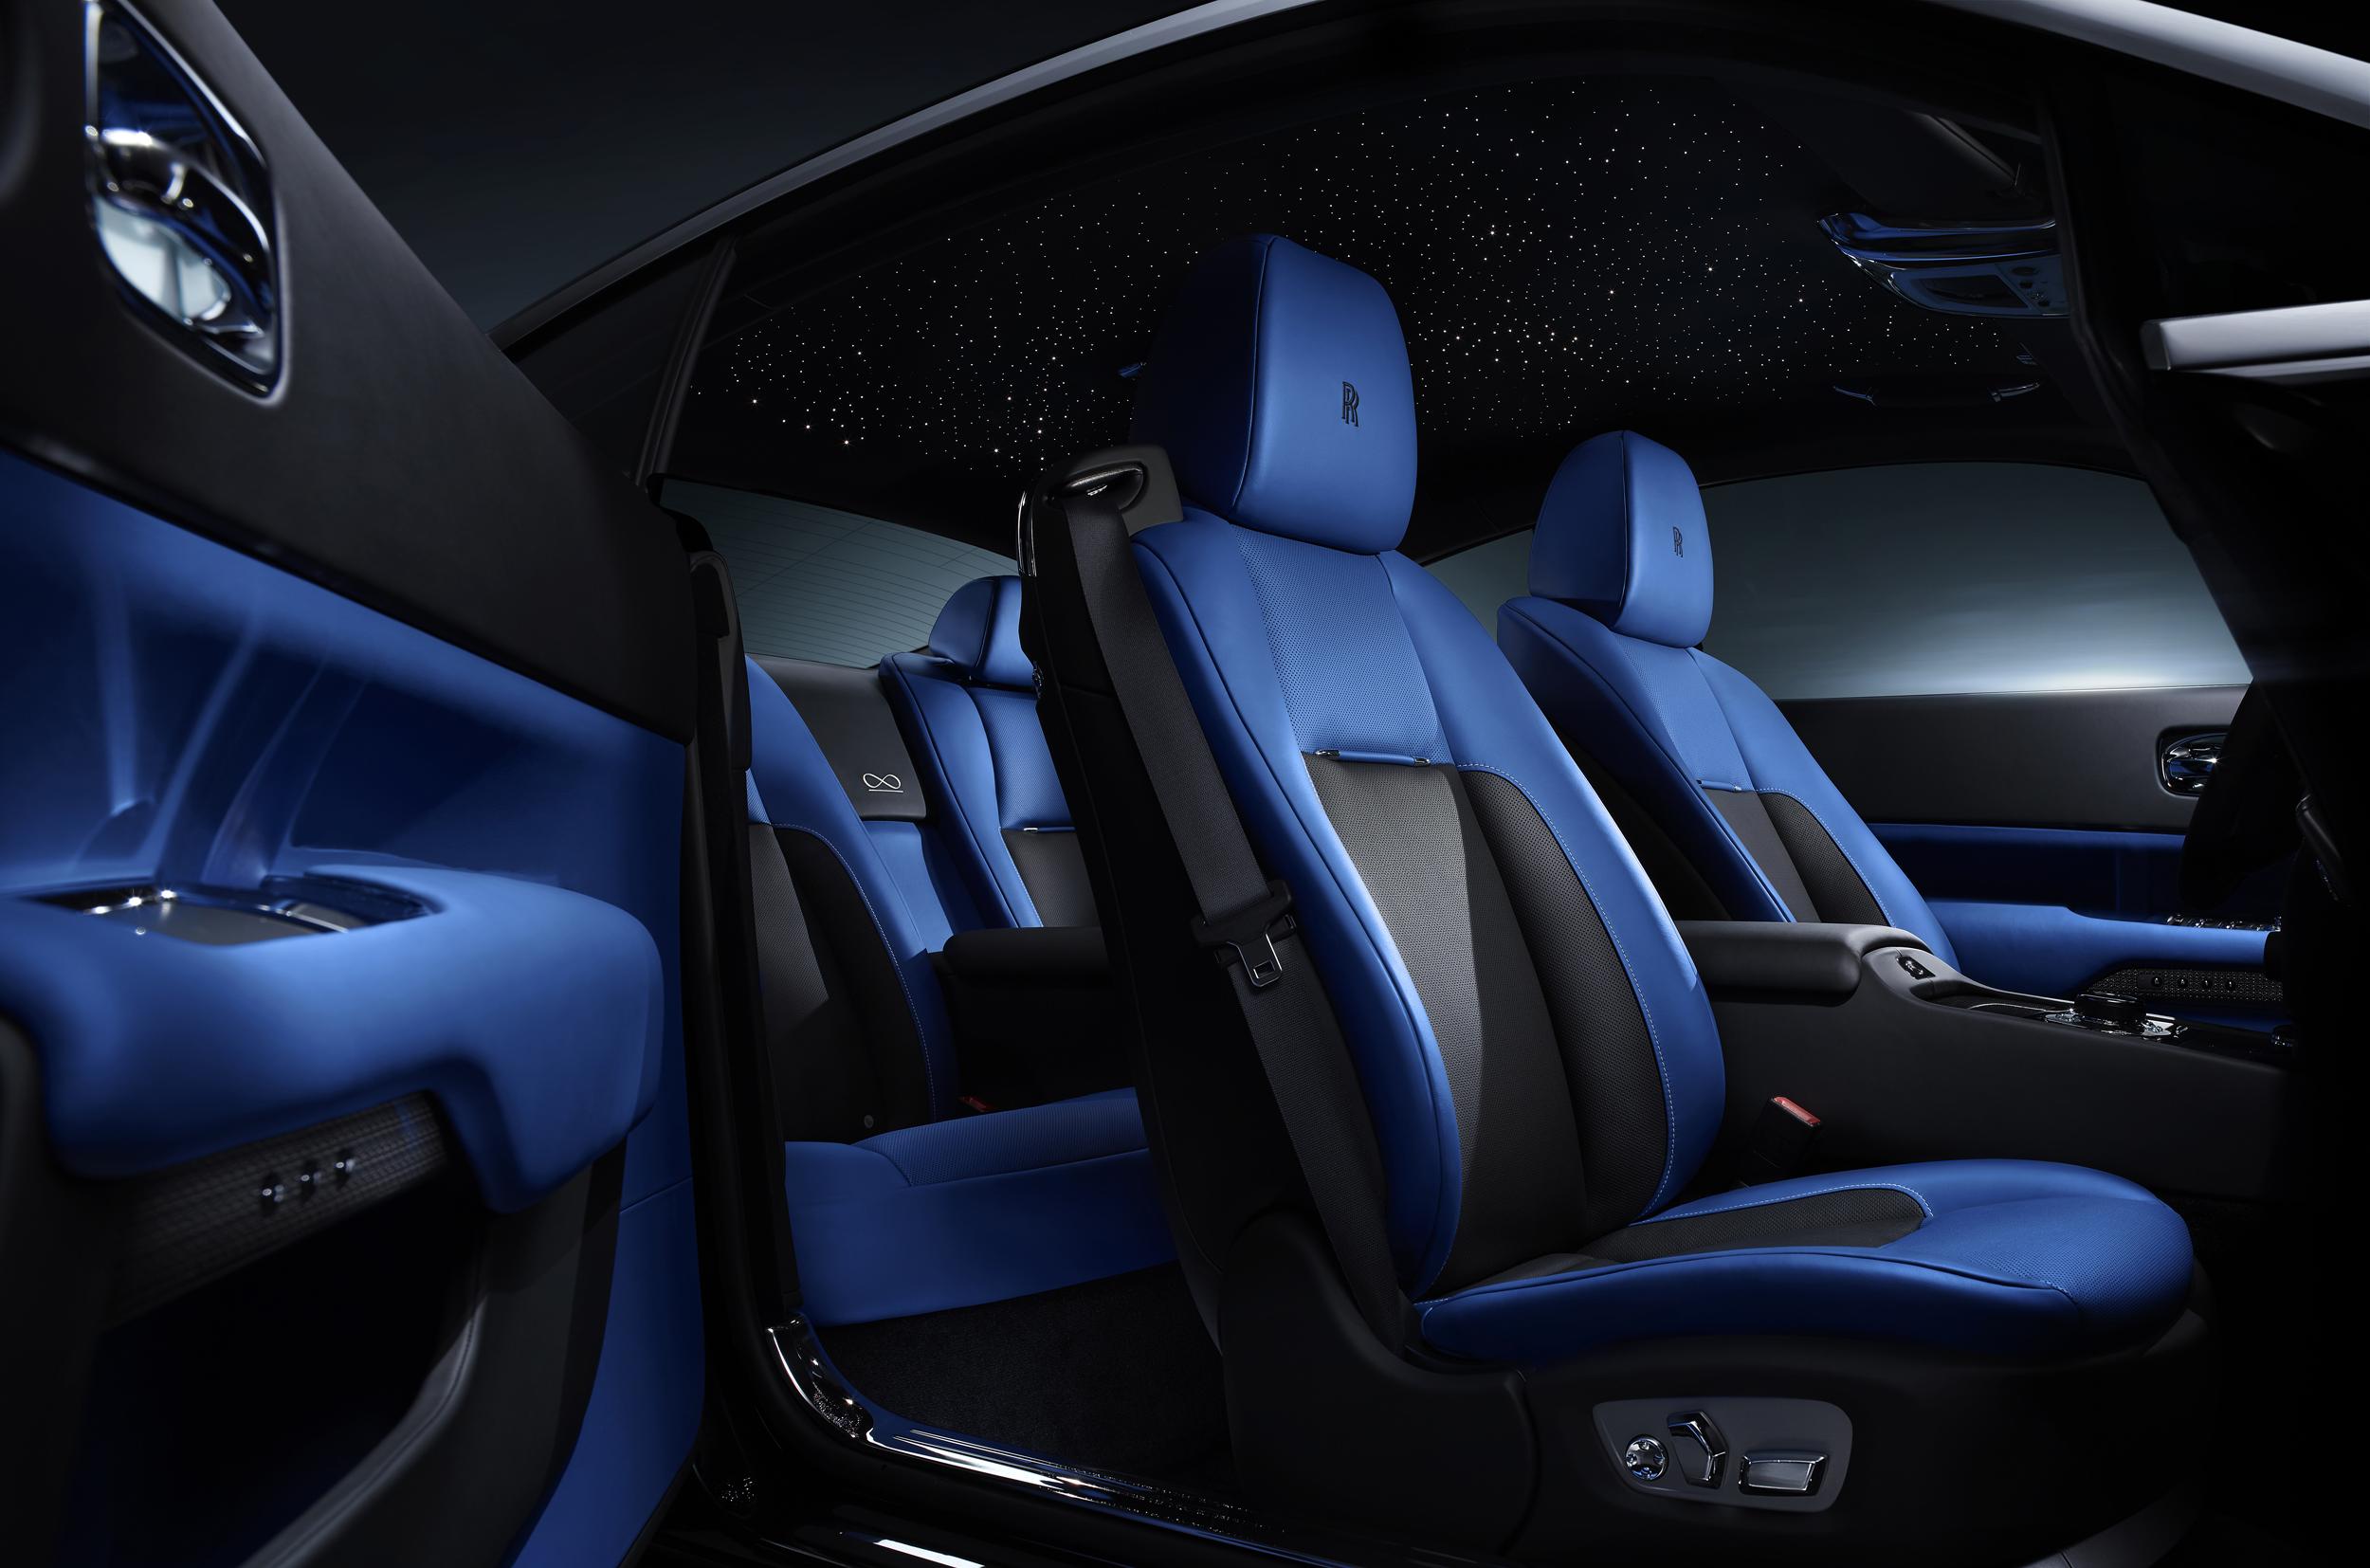 Dark interiors of the Rolls Royce Wraith